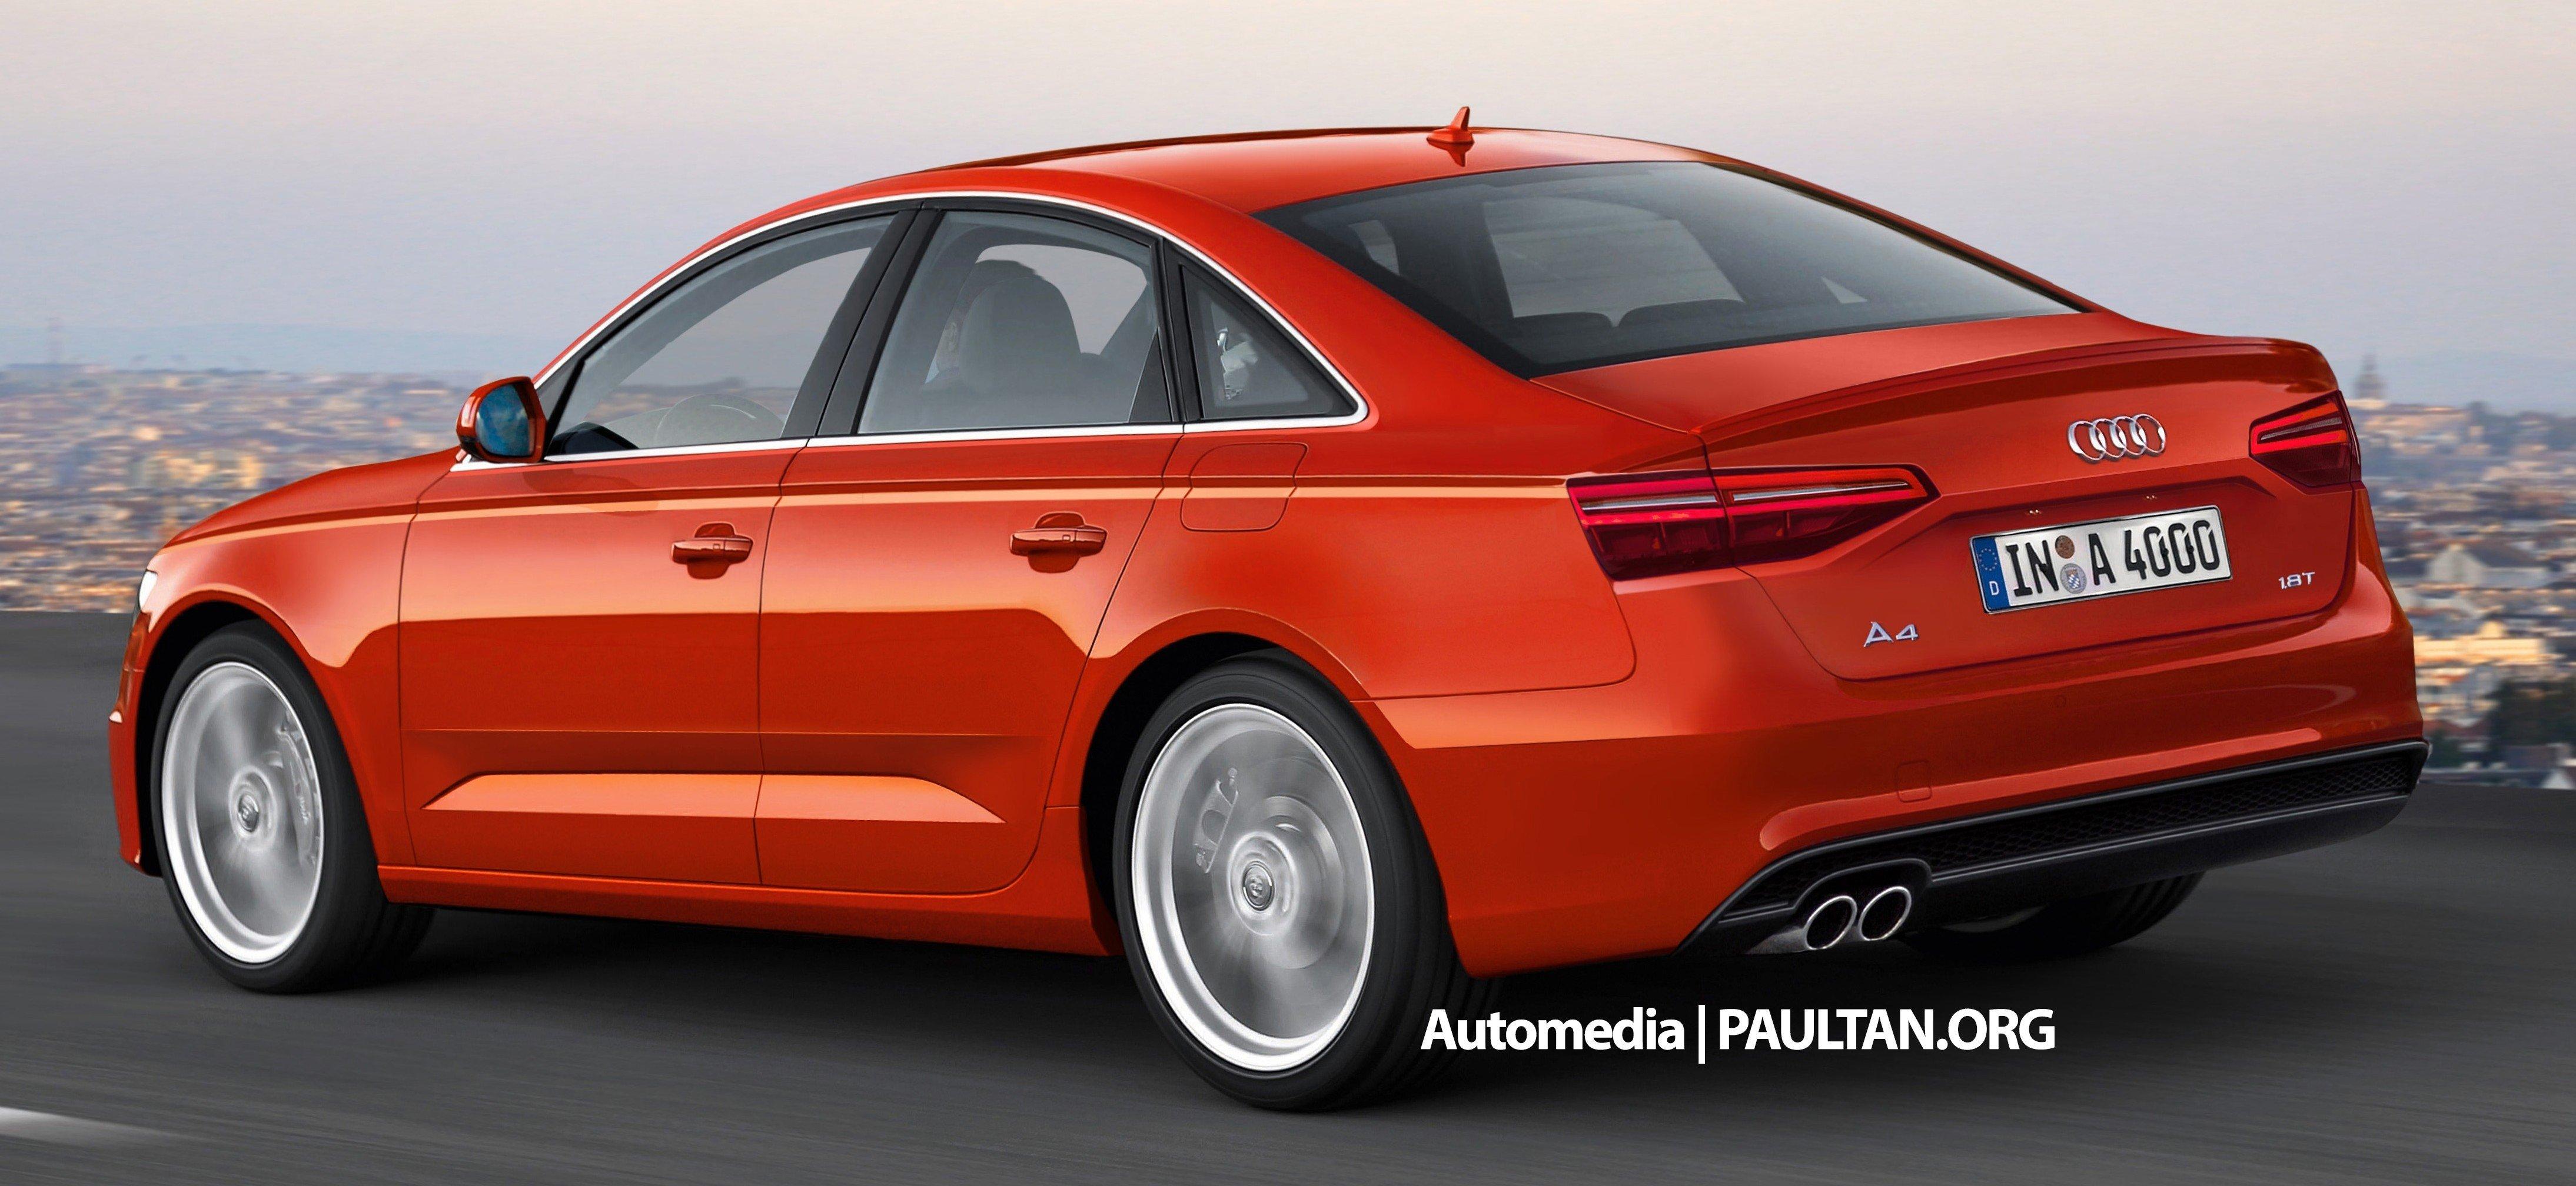 Audi A4 B9 Rendered 2015 Frankfurt Debut Likely Image 310916